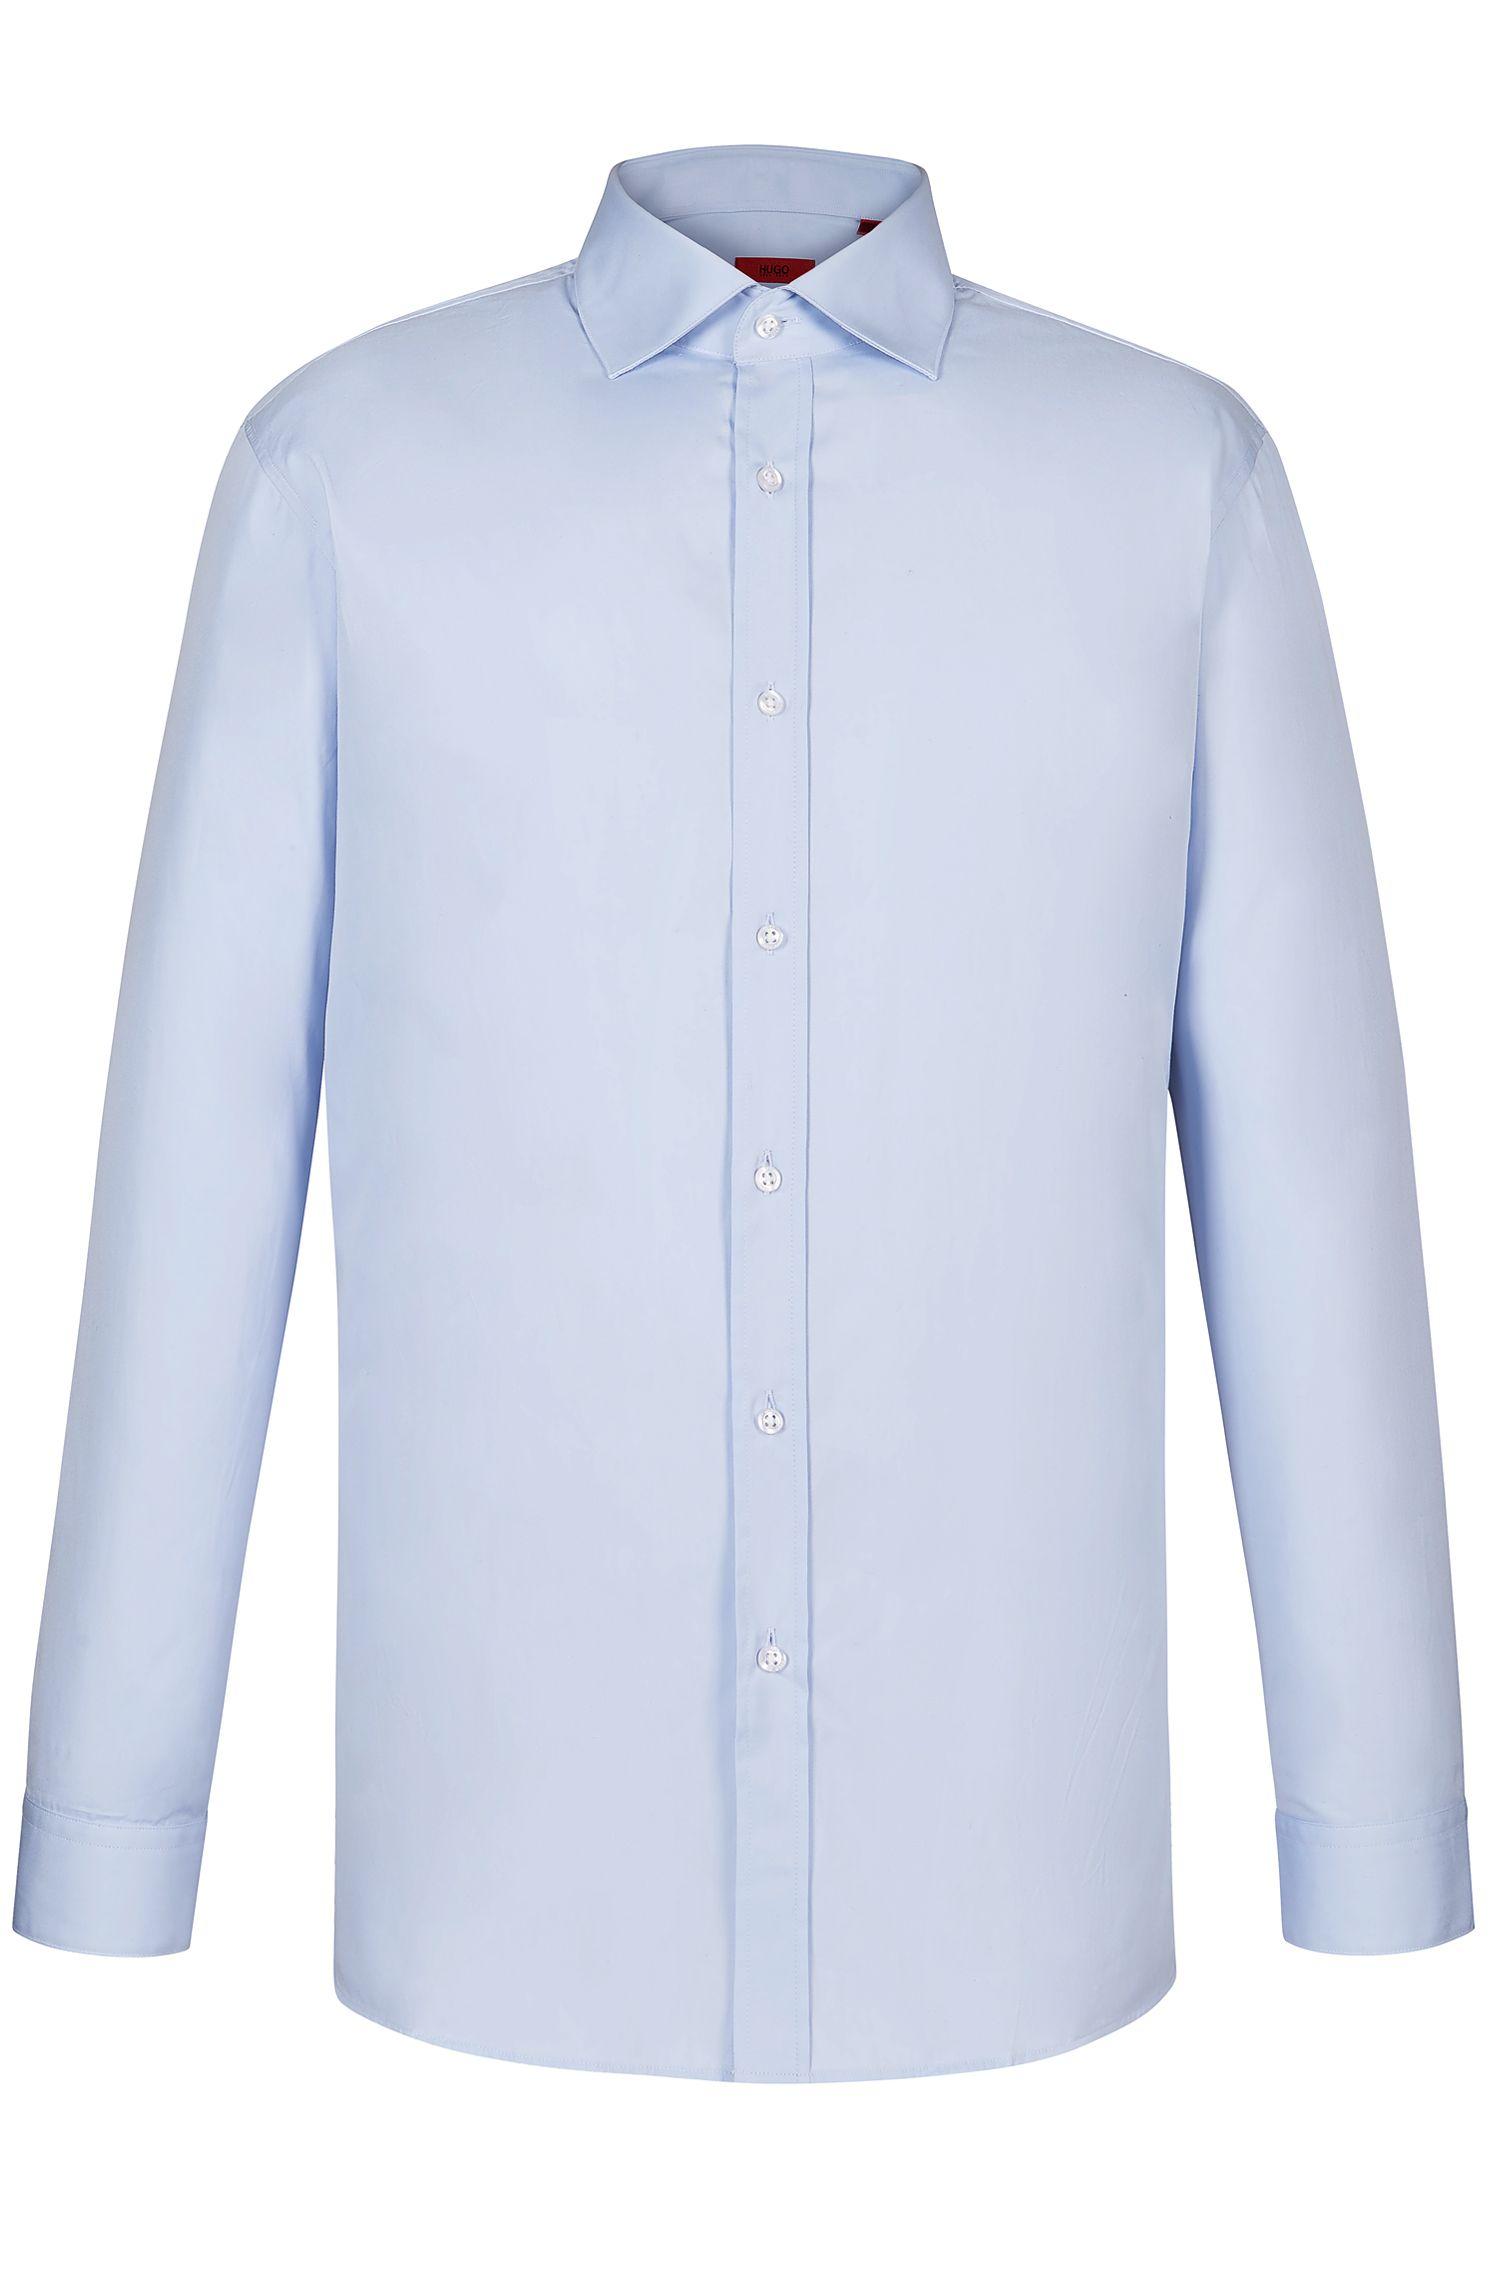 Point Collar Stretch Cotton Dress Shirt, Modern Fit | Enderson X